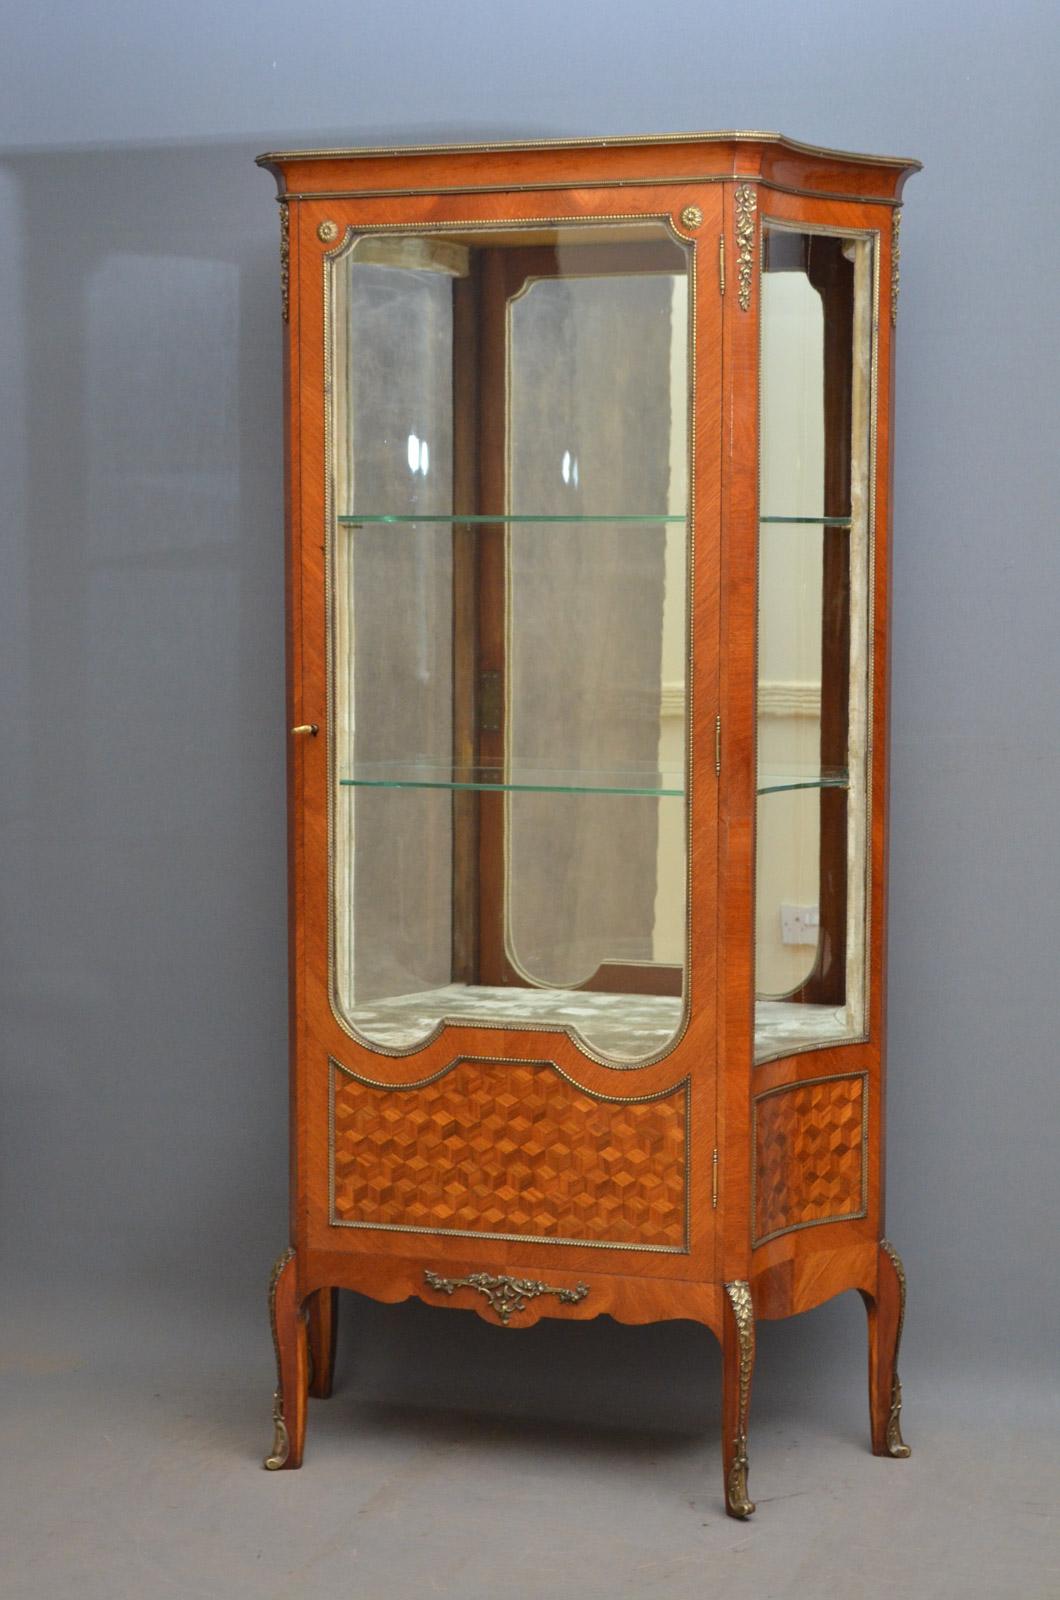 Antique French Display Cabinet  Nimbus Antiques